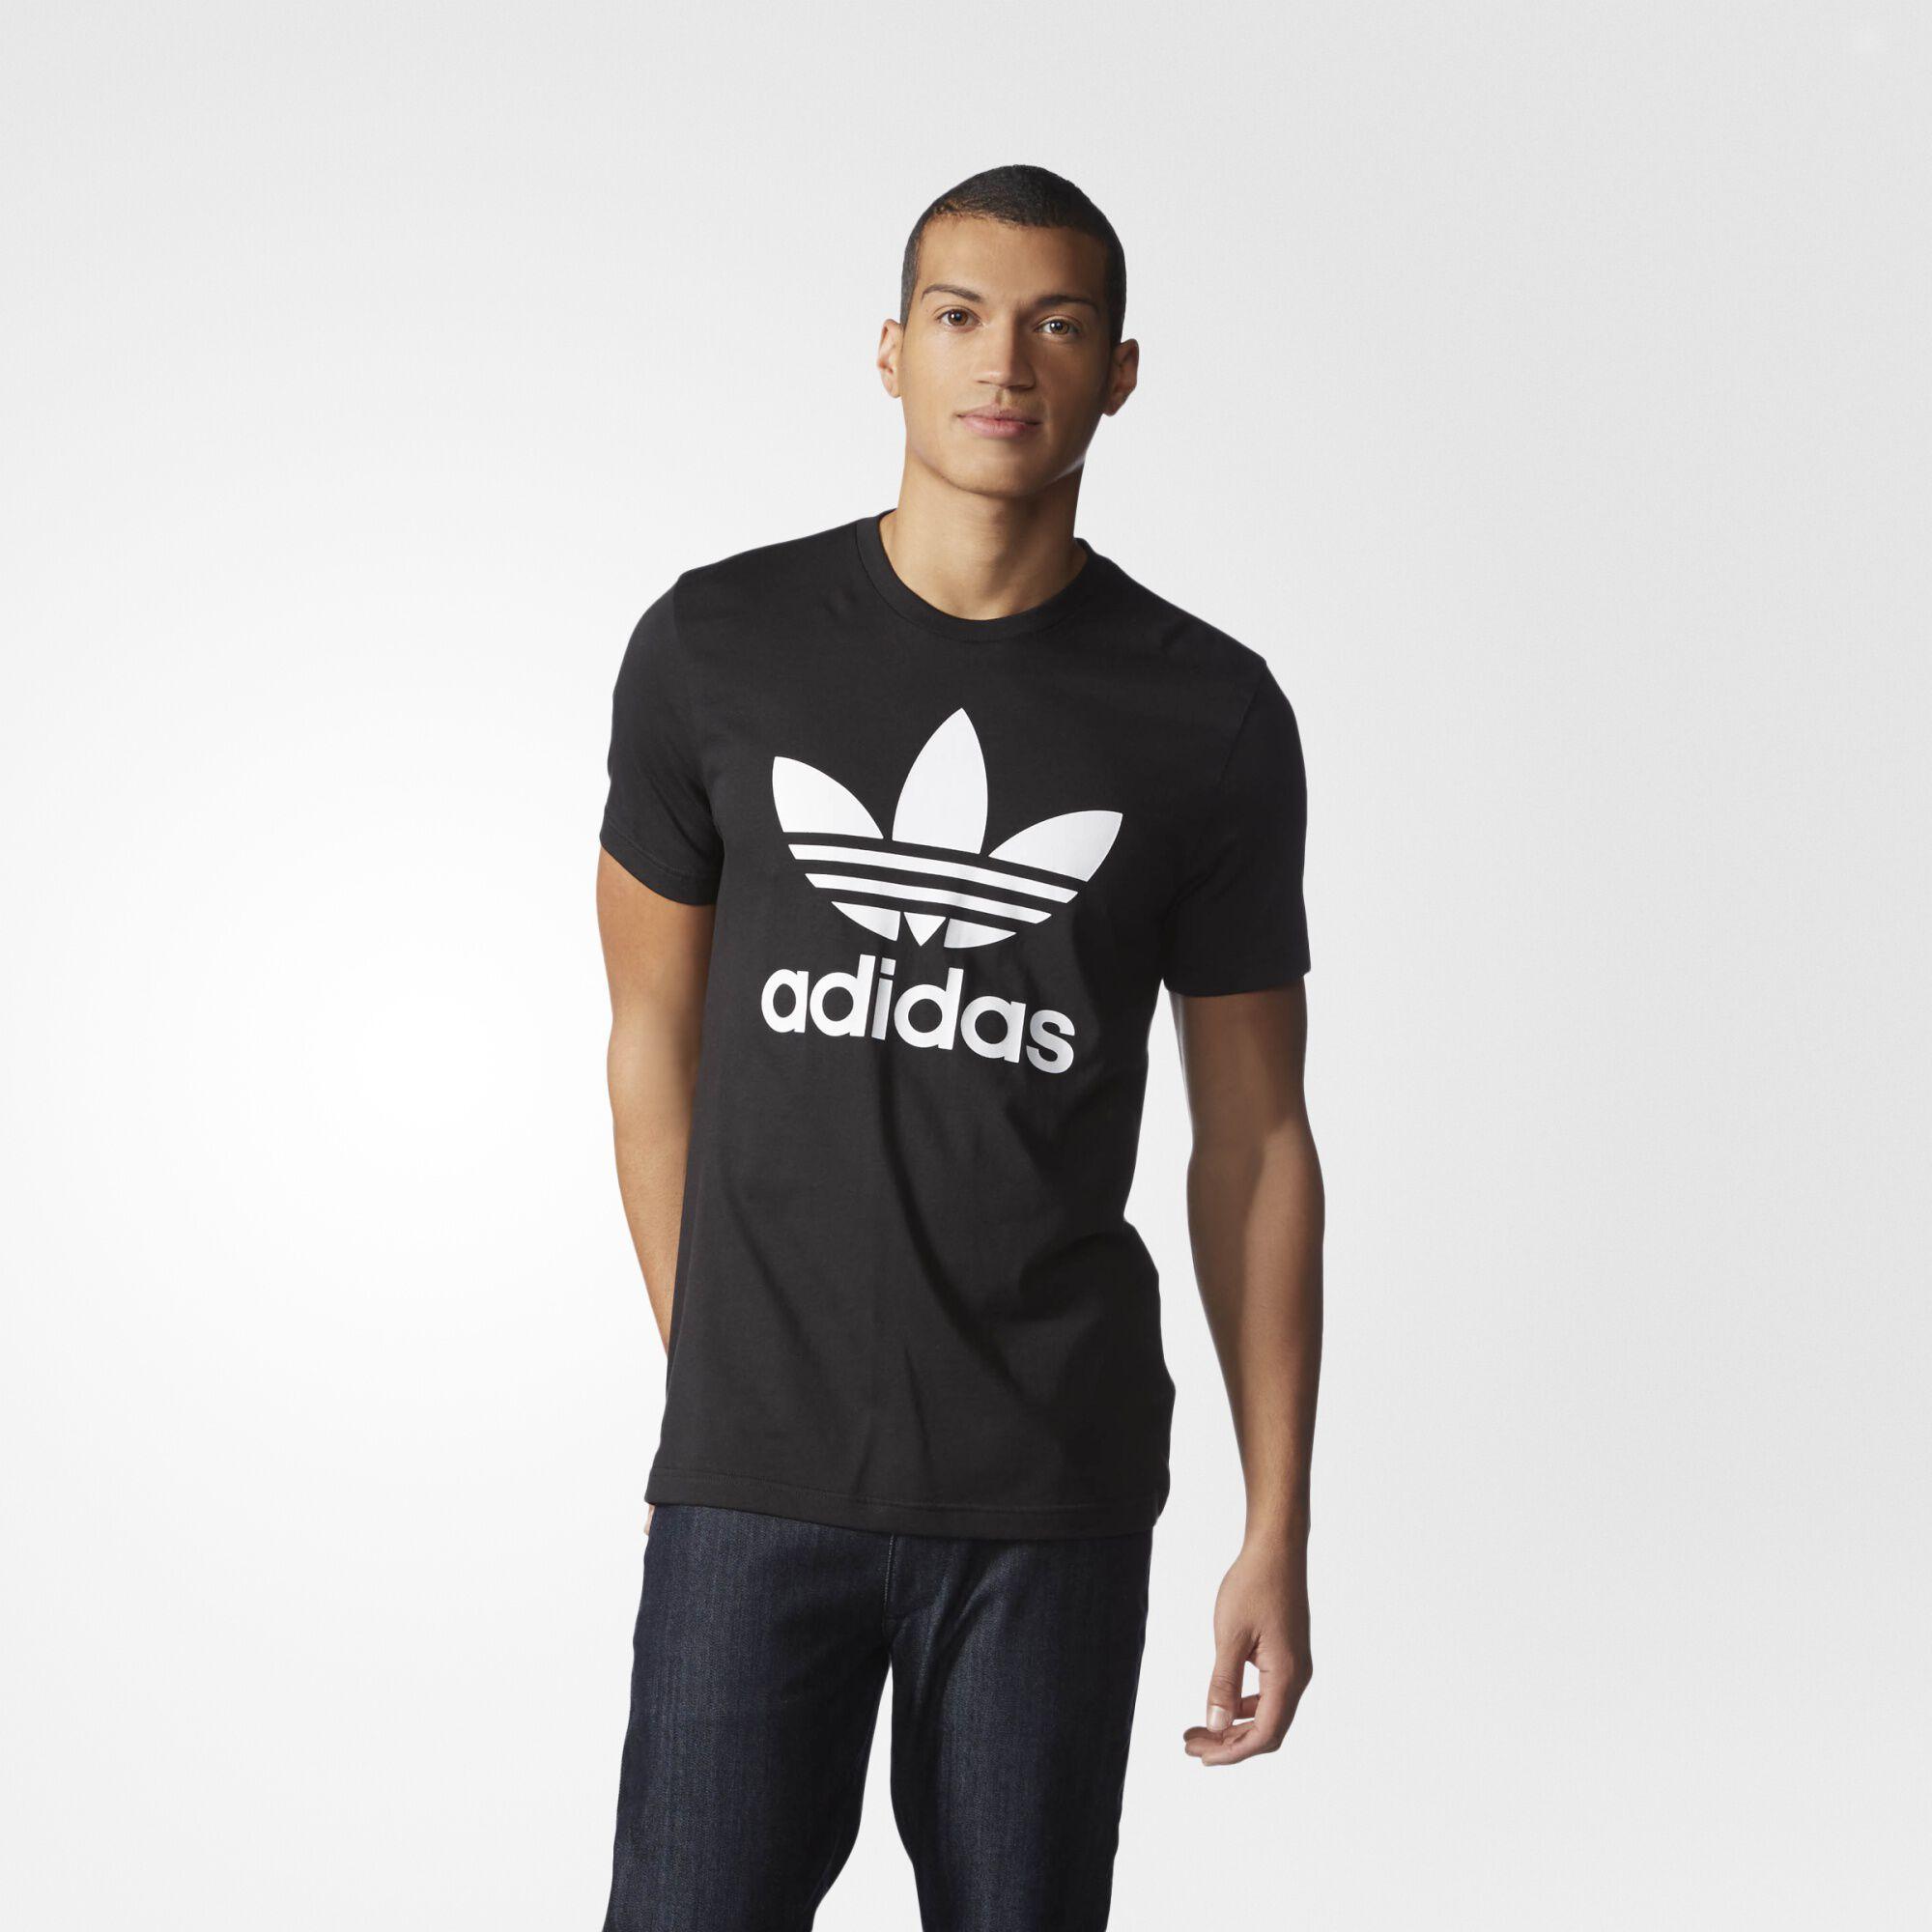 adidas originals sweatshirt mens